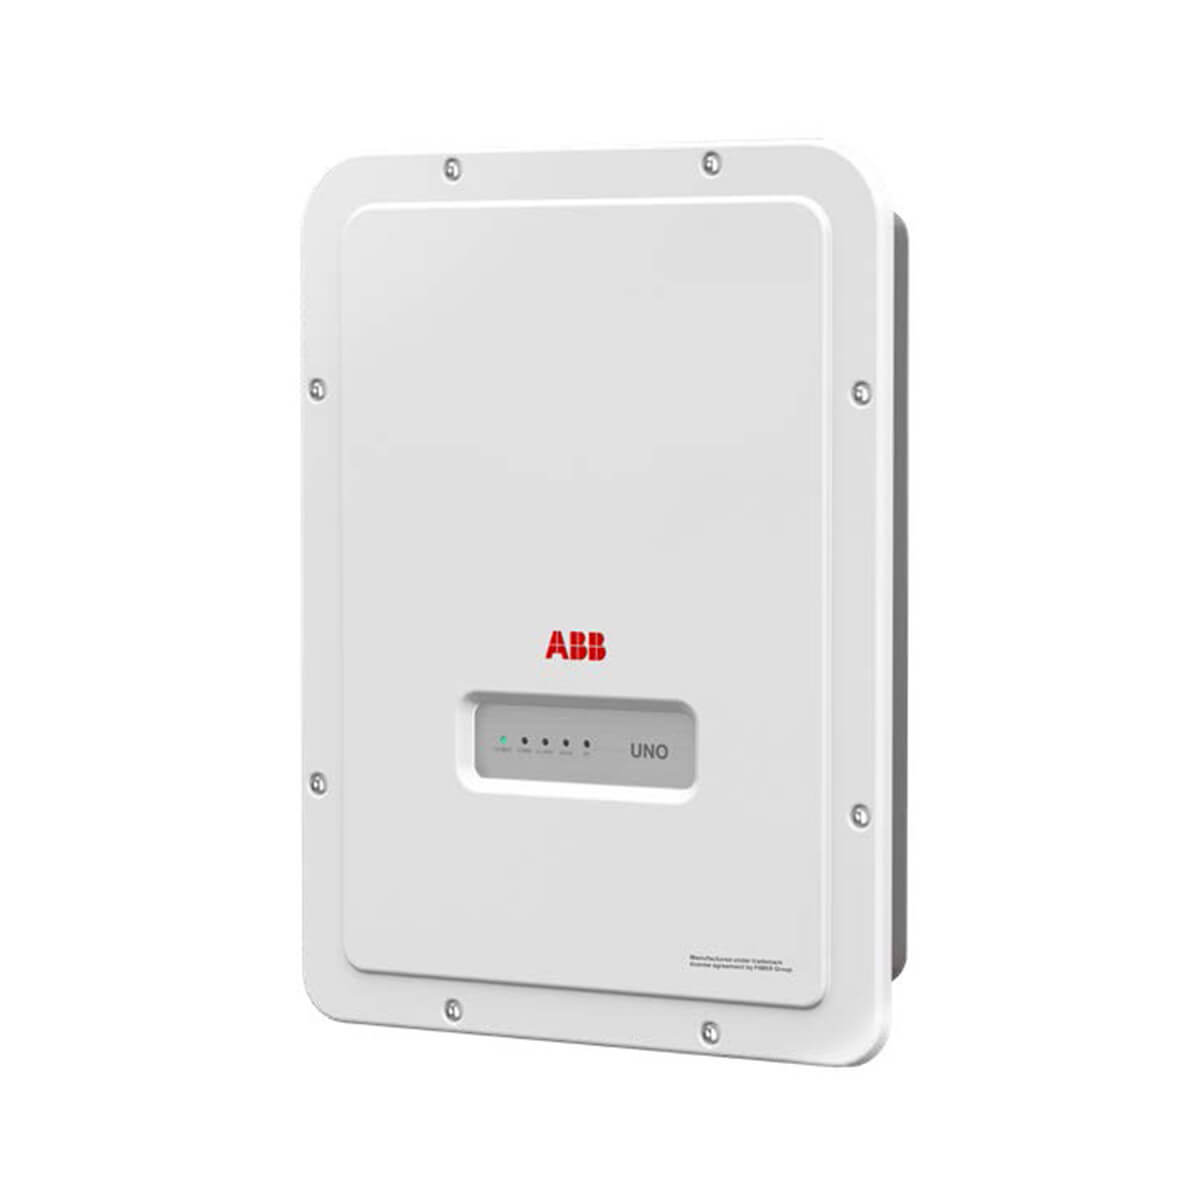 abb fimer 4kW inverter, abb fimer uno-dm 4kW inverter, abb fimer uno-dm-4.0-tl-plus-q inverter, abb fimer uno-dm-4.0-tl-plus-q, abb fimer uno-dm 4 kW, ABB FIMER 4 KW